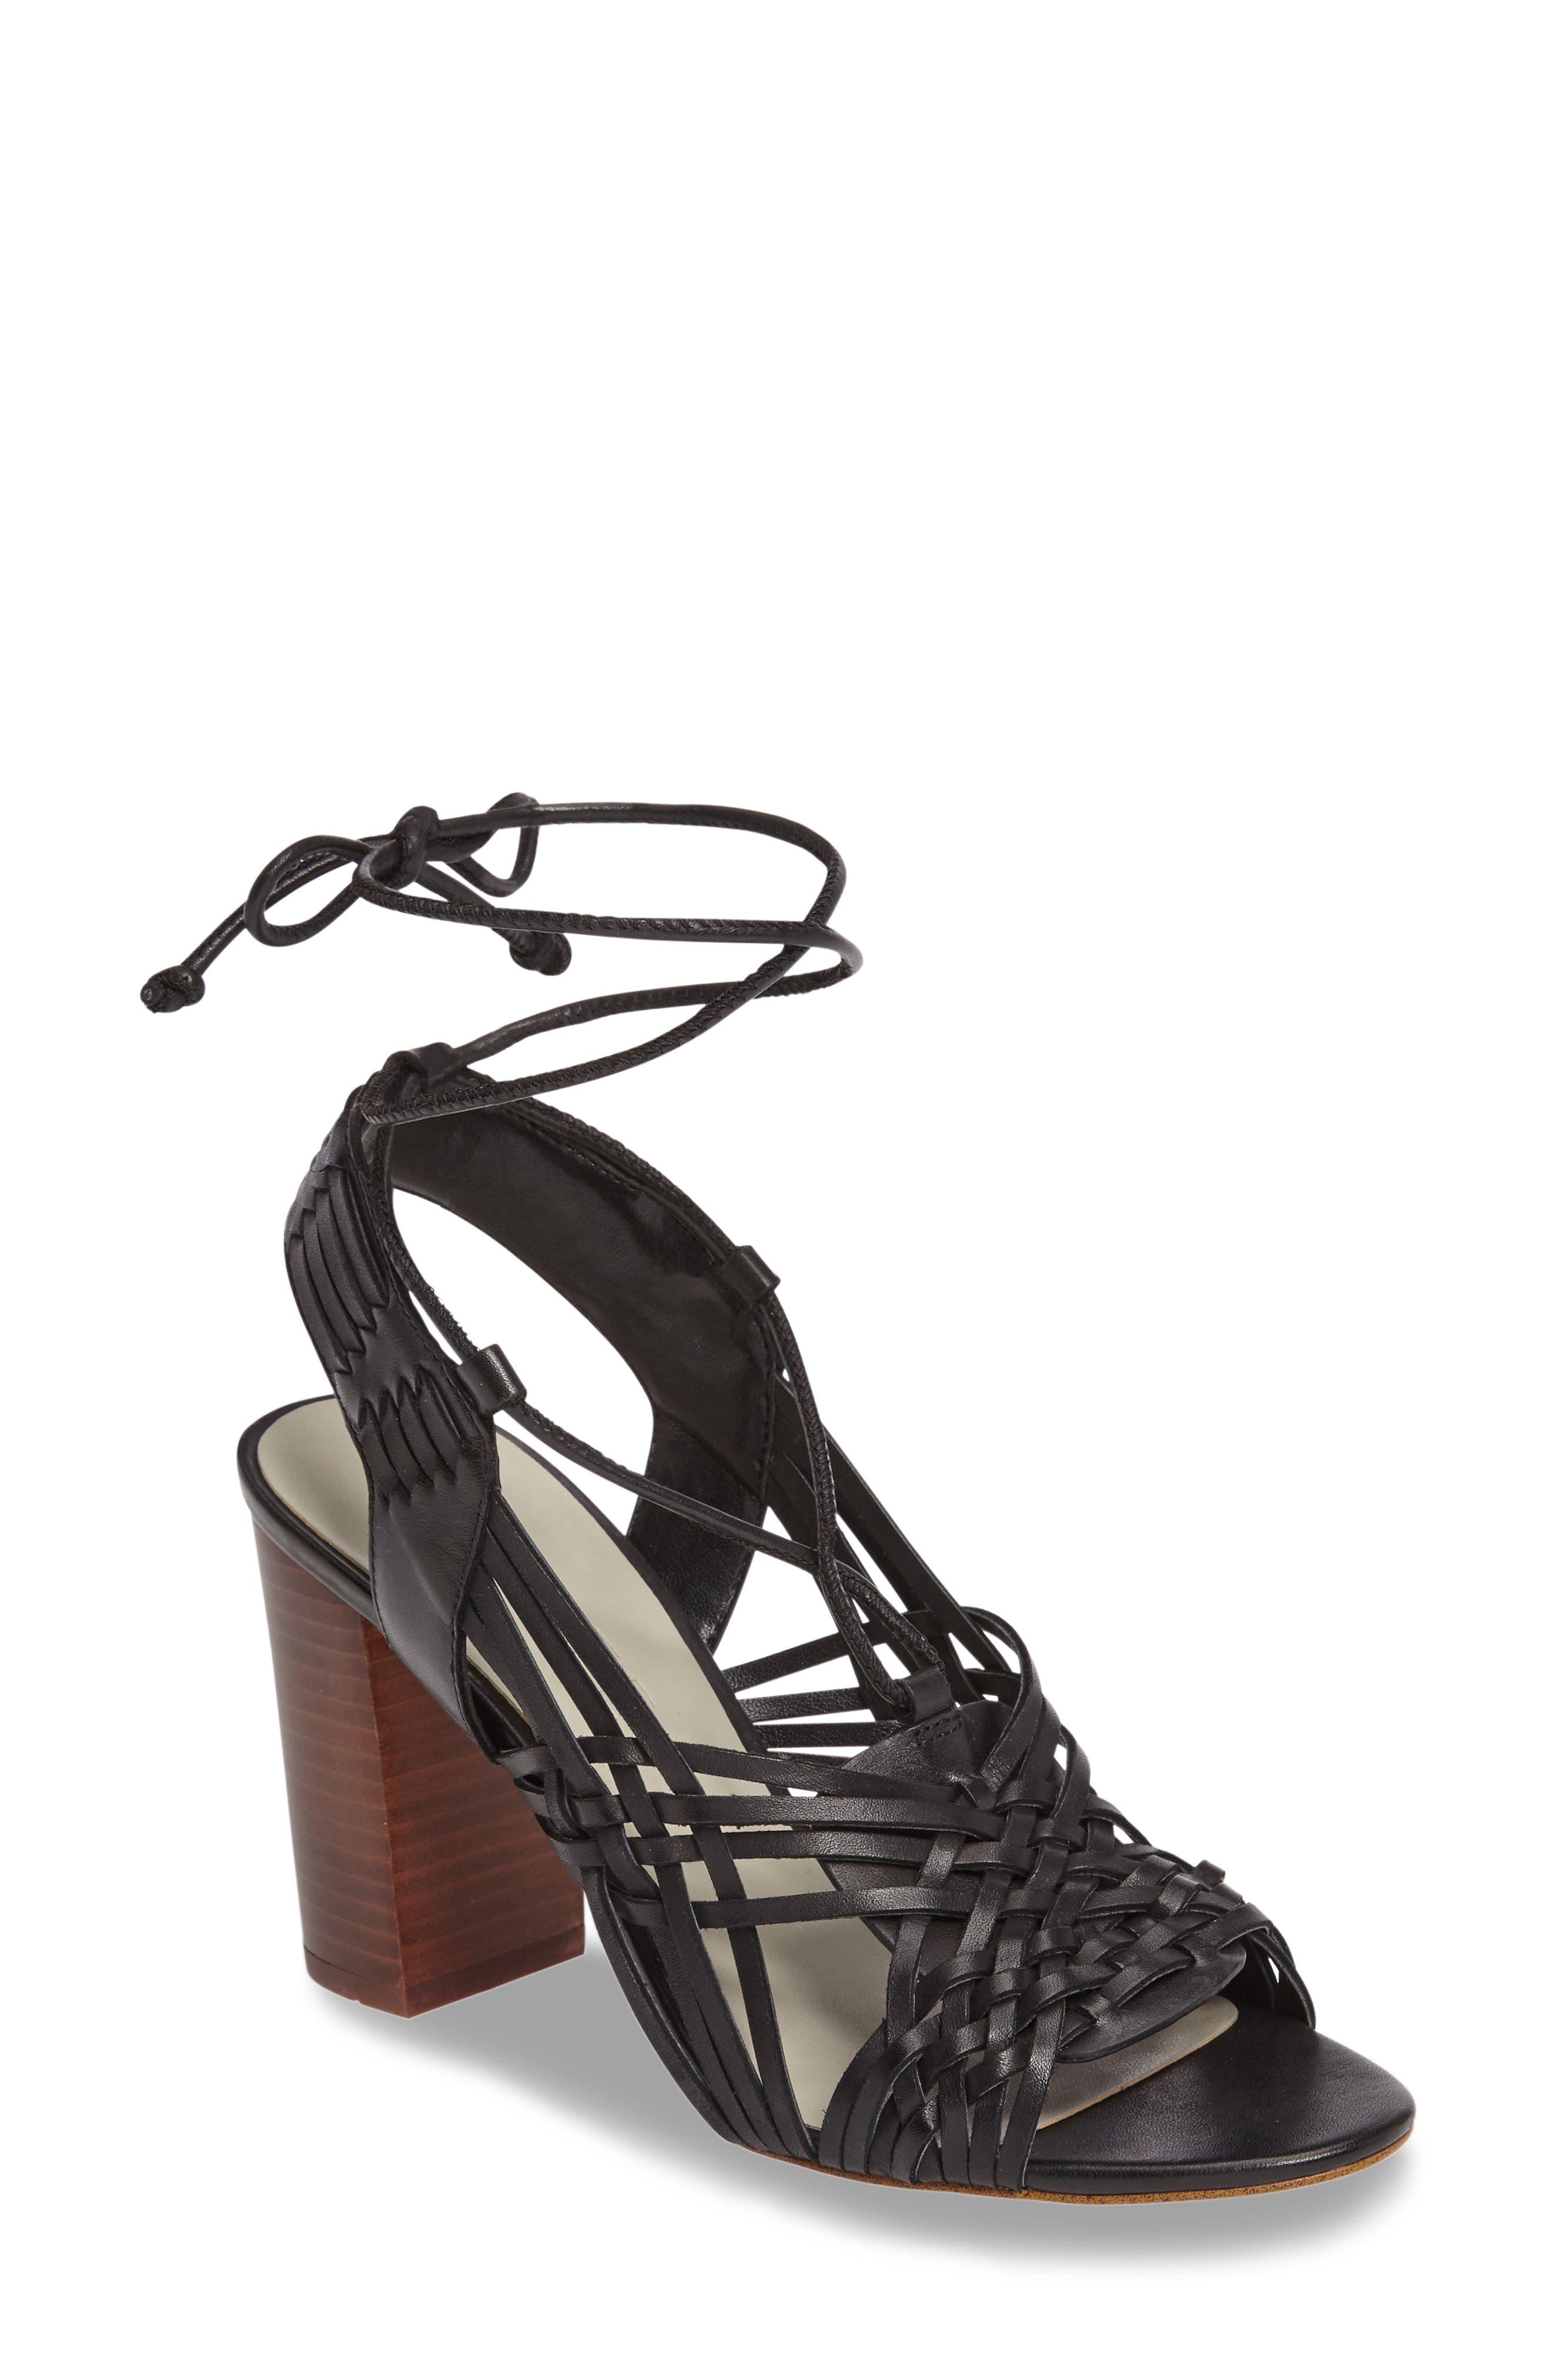 Main Image - 1.STATE Shannen Block Heel Sandal (Women)